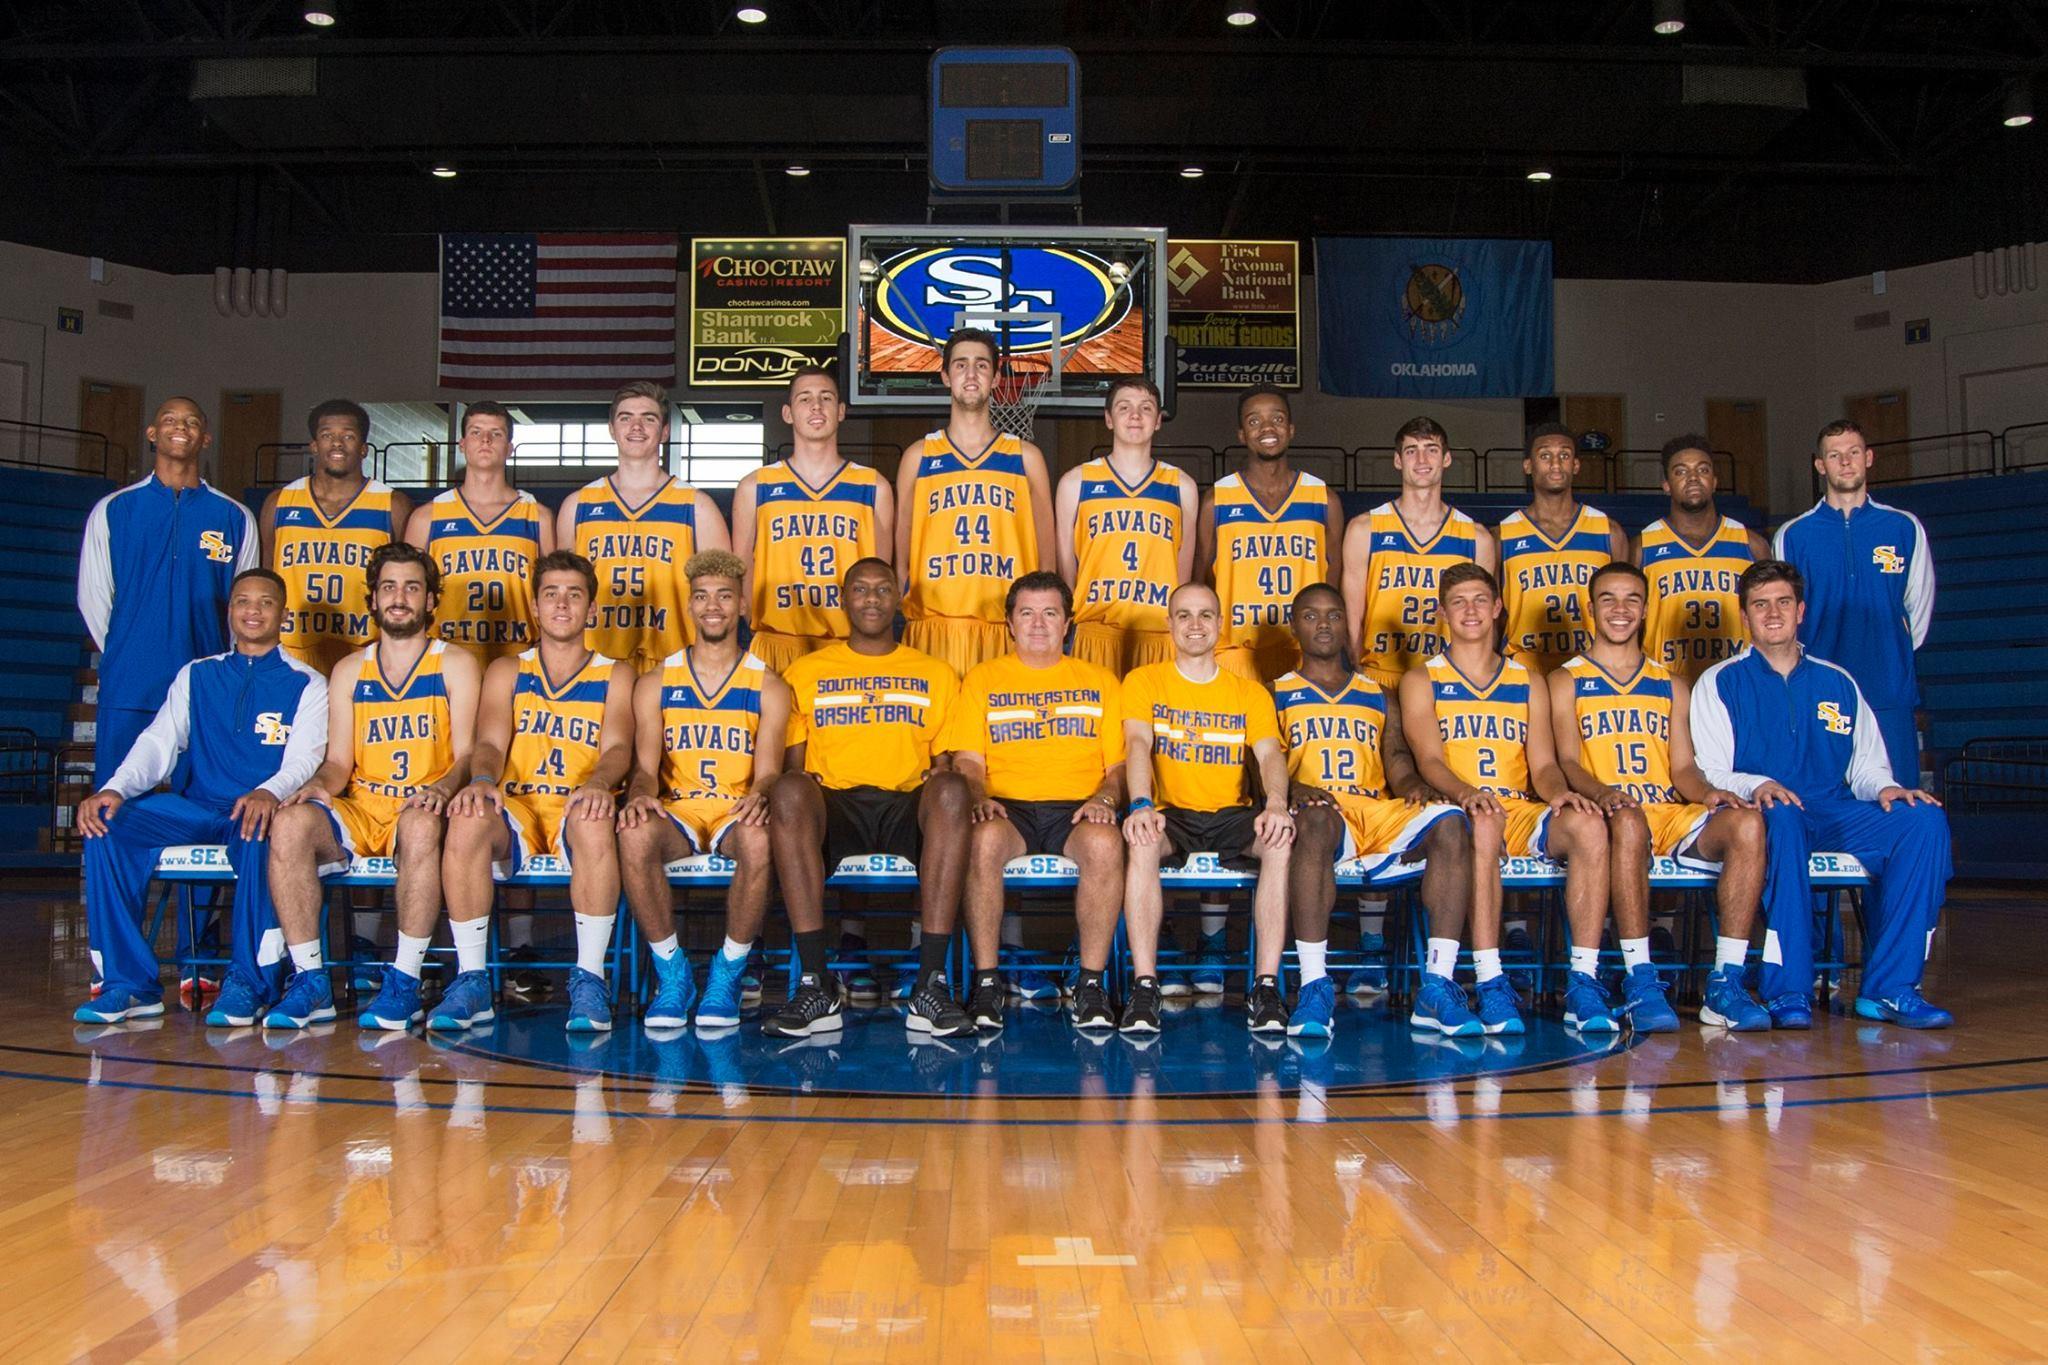 Southeastern Men's Basketball team. Photo courtesy of gosoutheastern.com